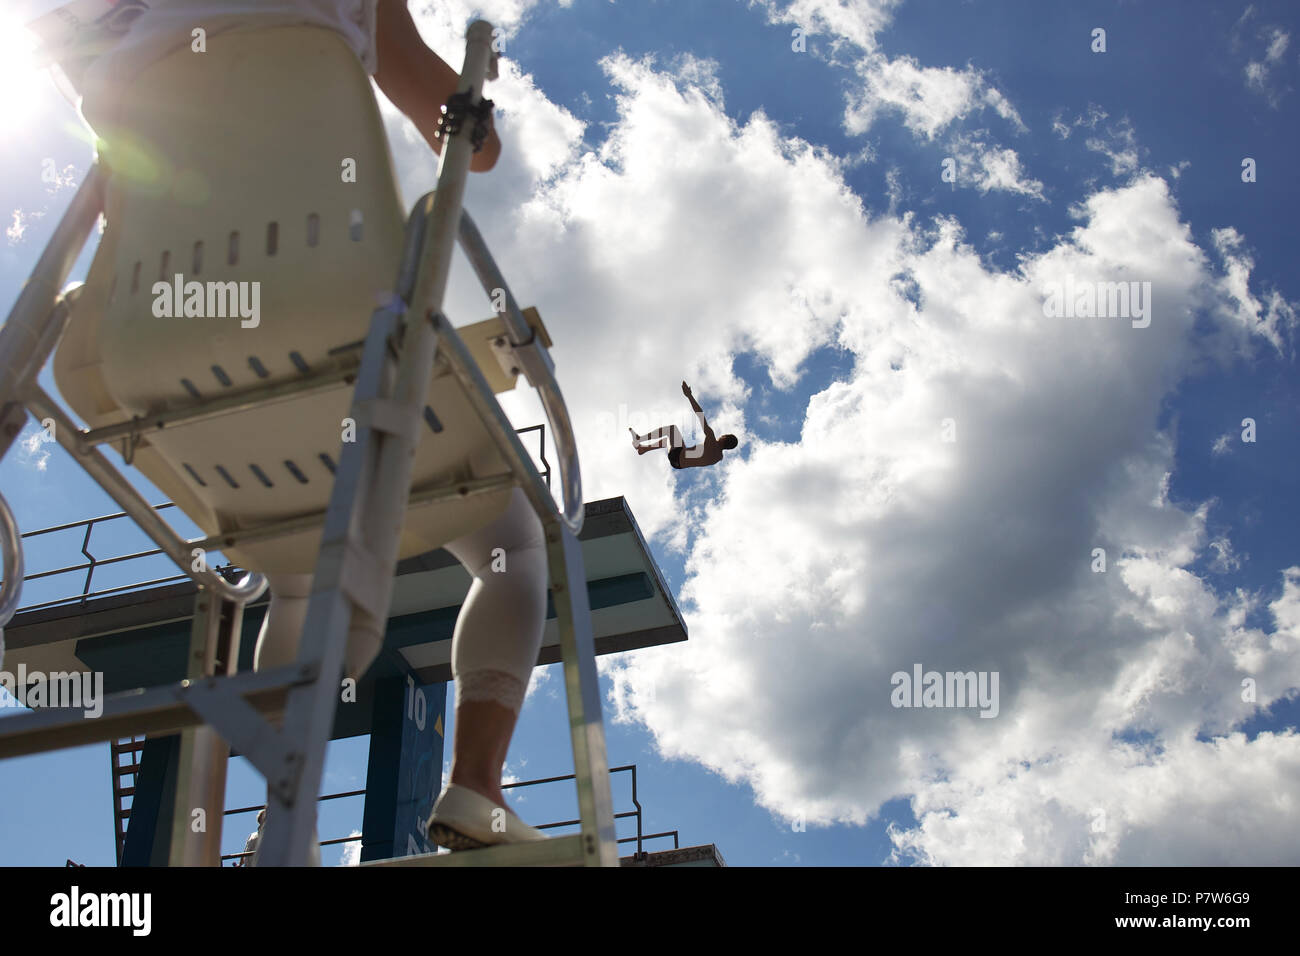 Bolzano, Italy. 07th, Jul 2018. Rogava Sandro from Russia competes in the Men's 10m Platform Diving Semi-Final on day two at Bolzano Lido, during 24th FINA Diving Grand Prix in Bolzano, Italy, 07 July 2018. (PHOTO) Alejandro Sala/Alamy Live News Stock Photo